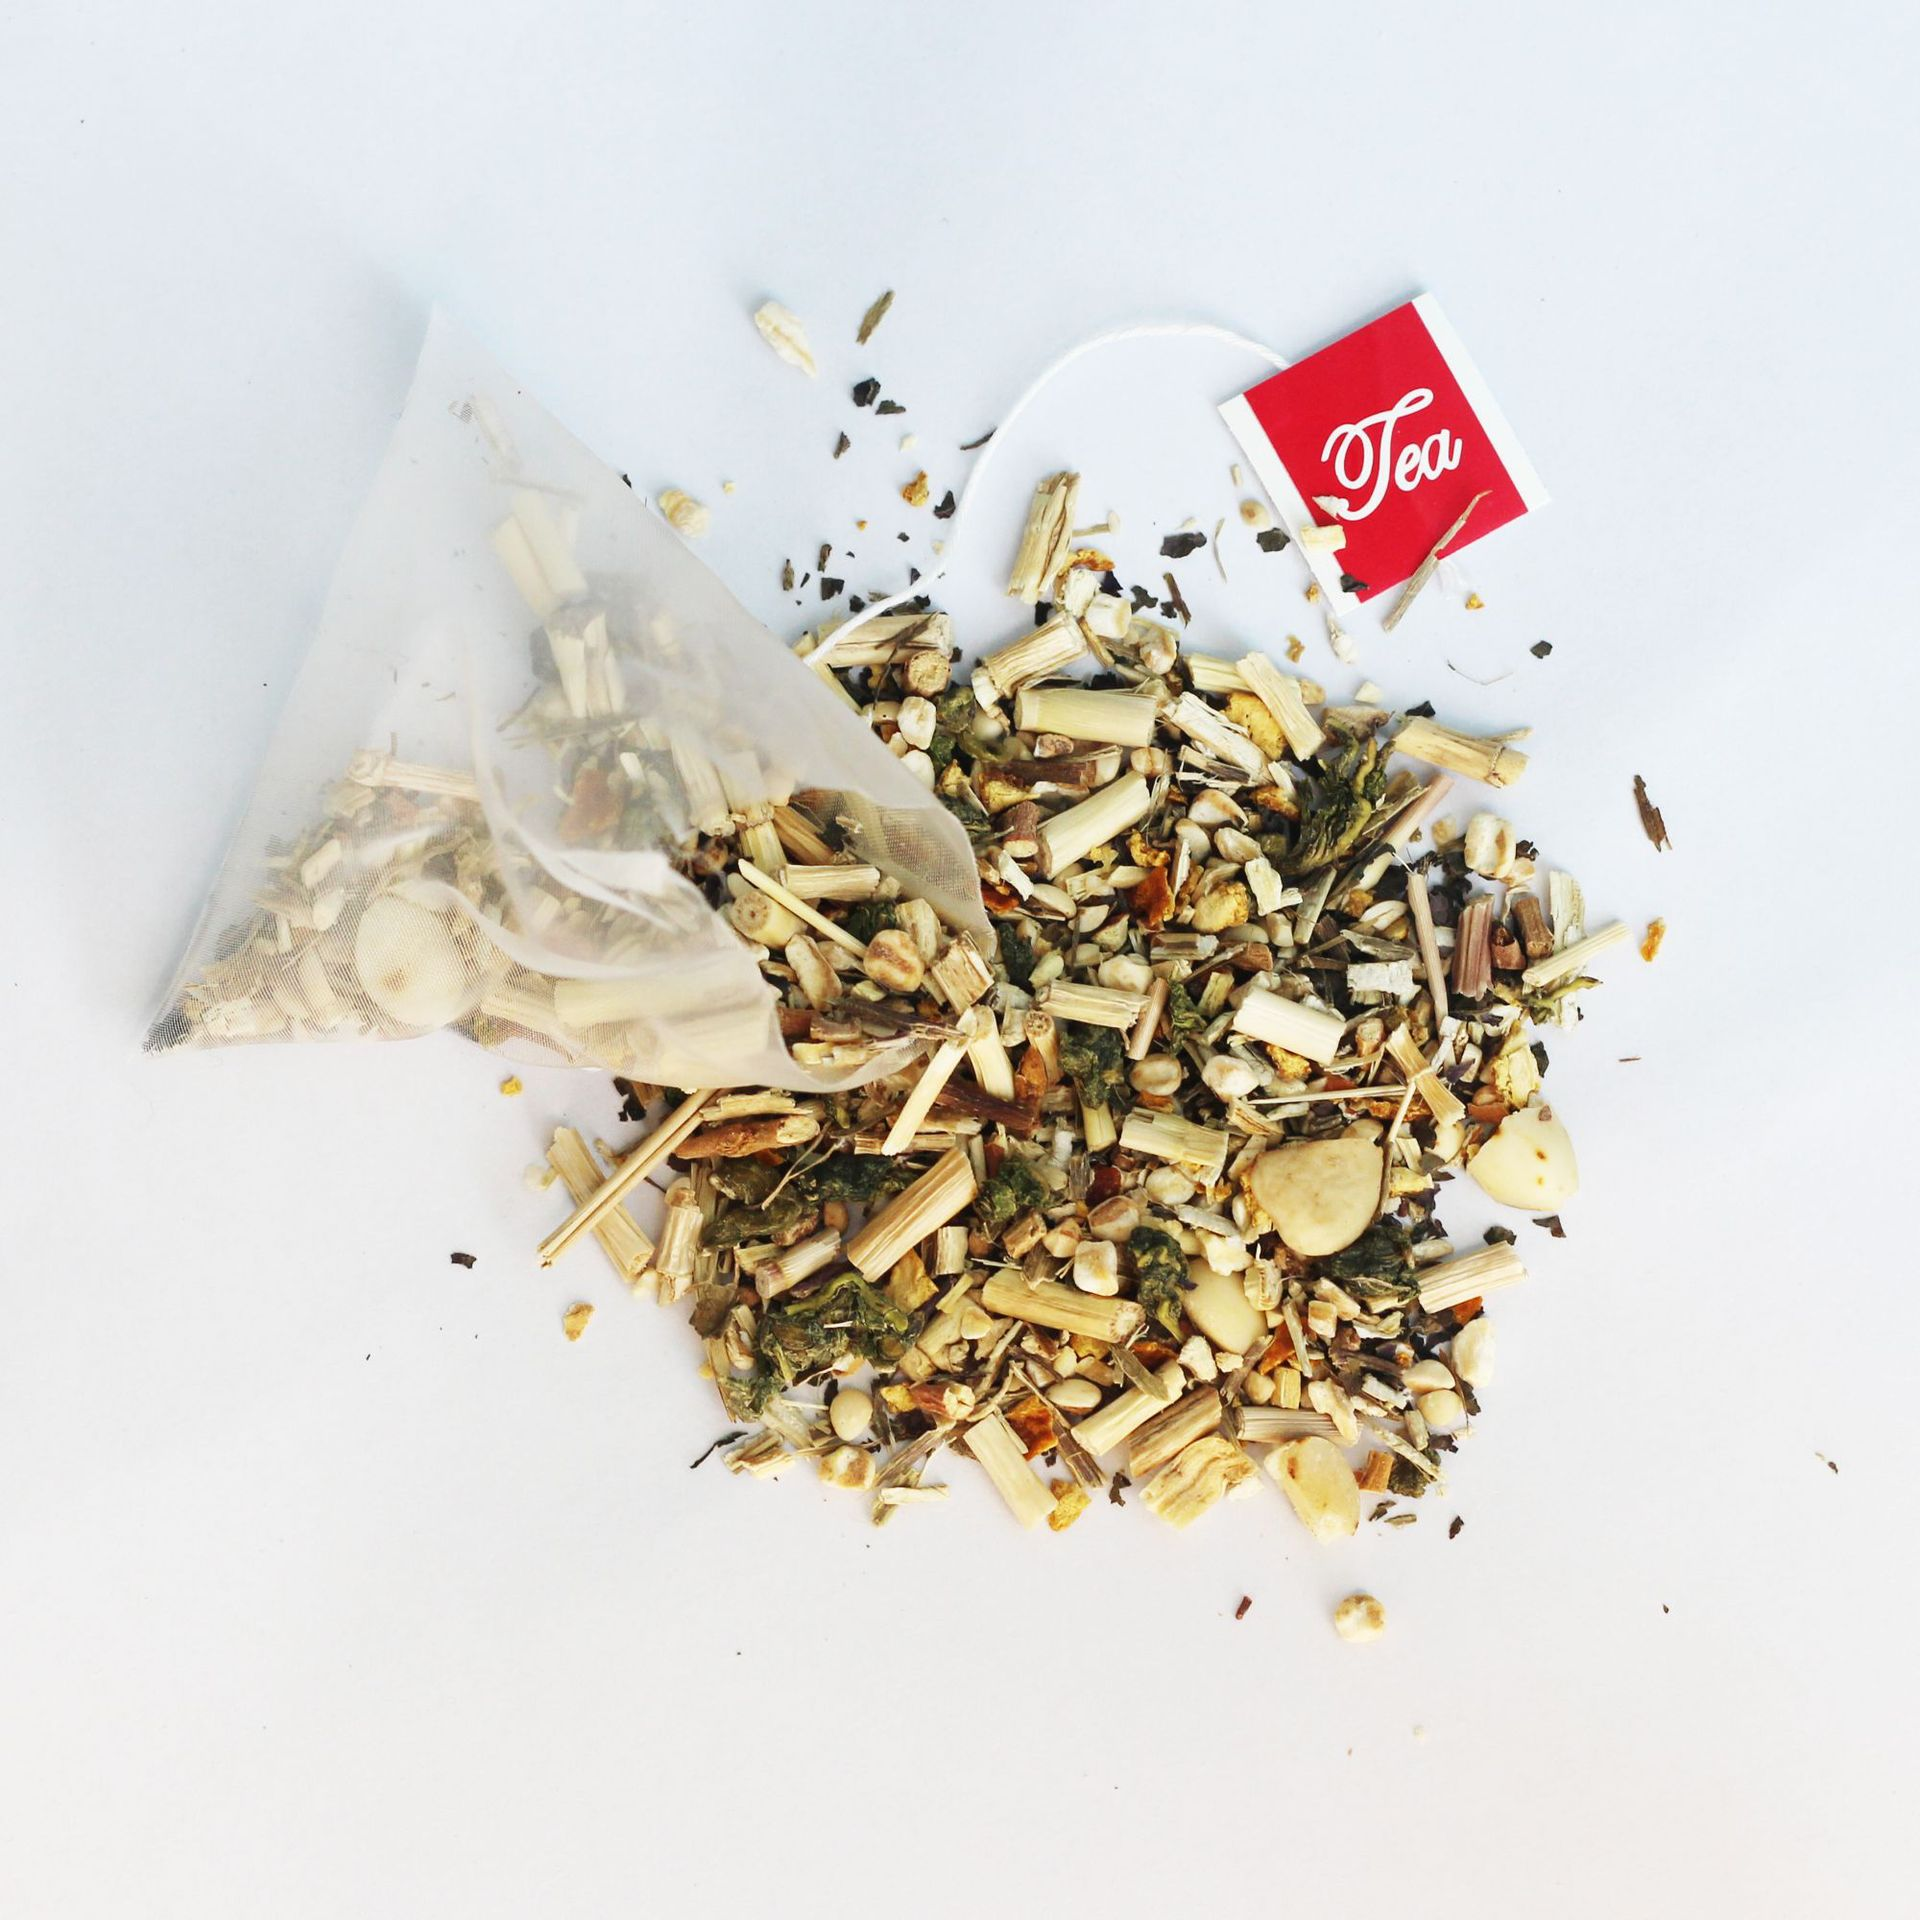 Wholesale OEM Organic Tea Apricot Kernel Perilla Leaf Tea For Moistening Lung And Dry SkinTea Bags With Reasonable Price - 4uTea | 4uTea.com